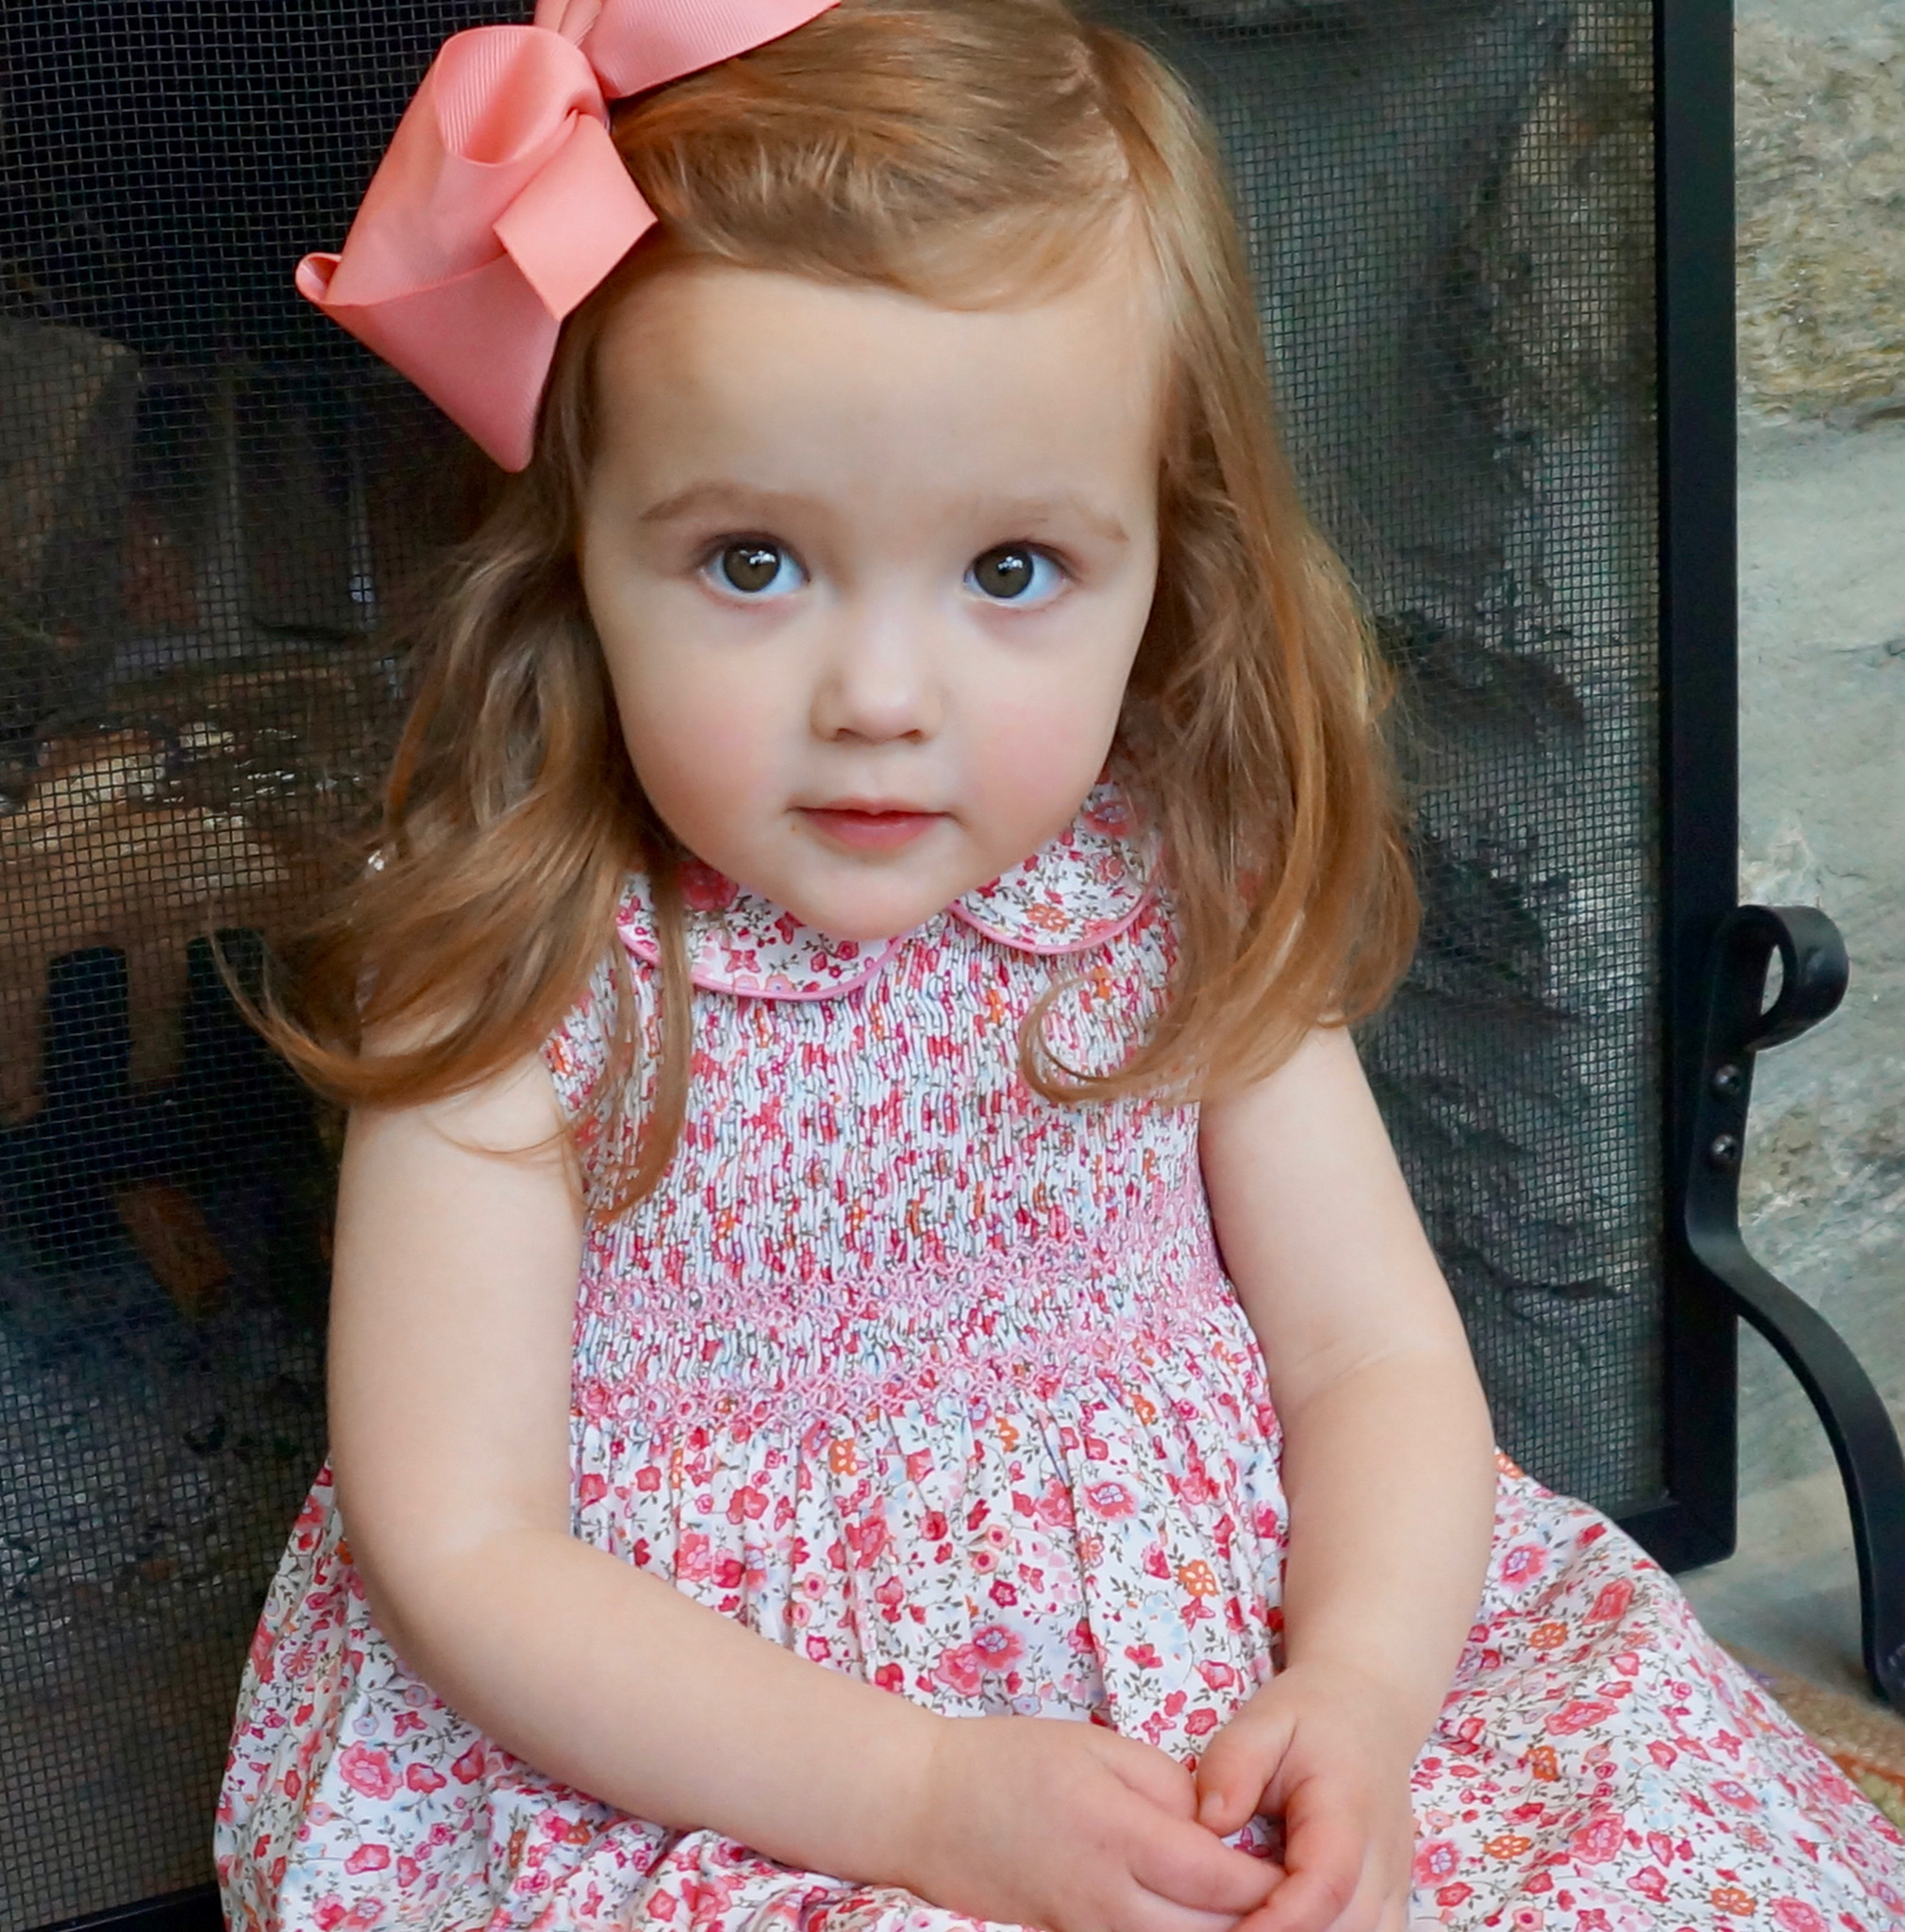 my grand daughter